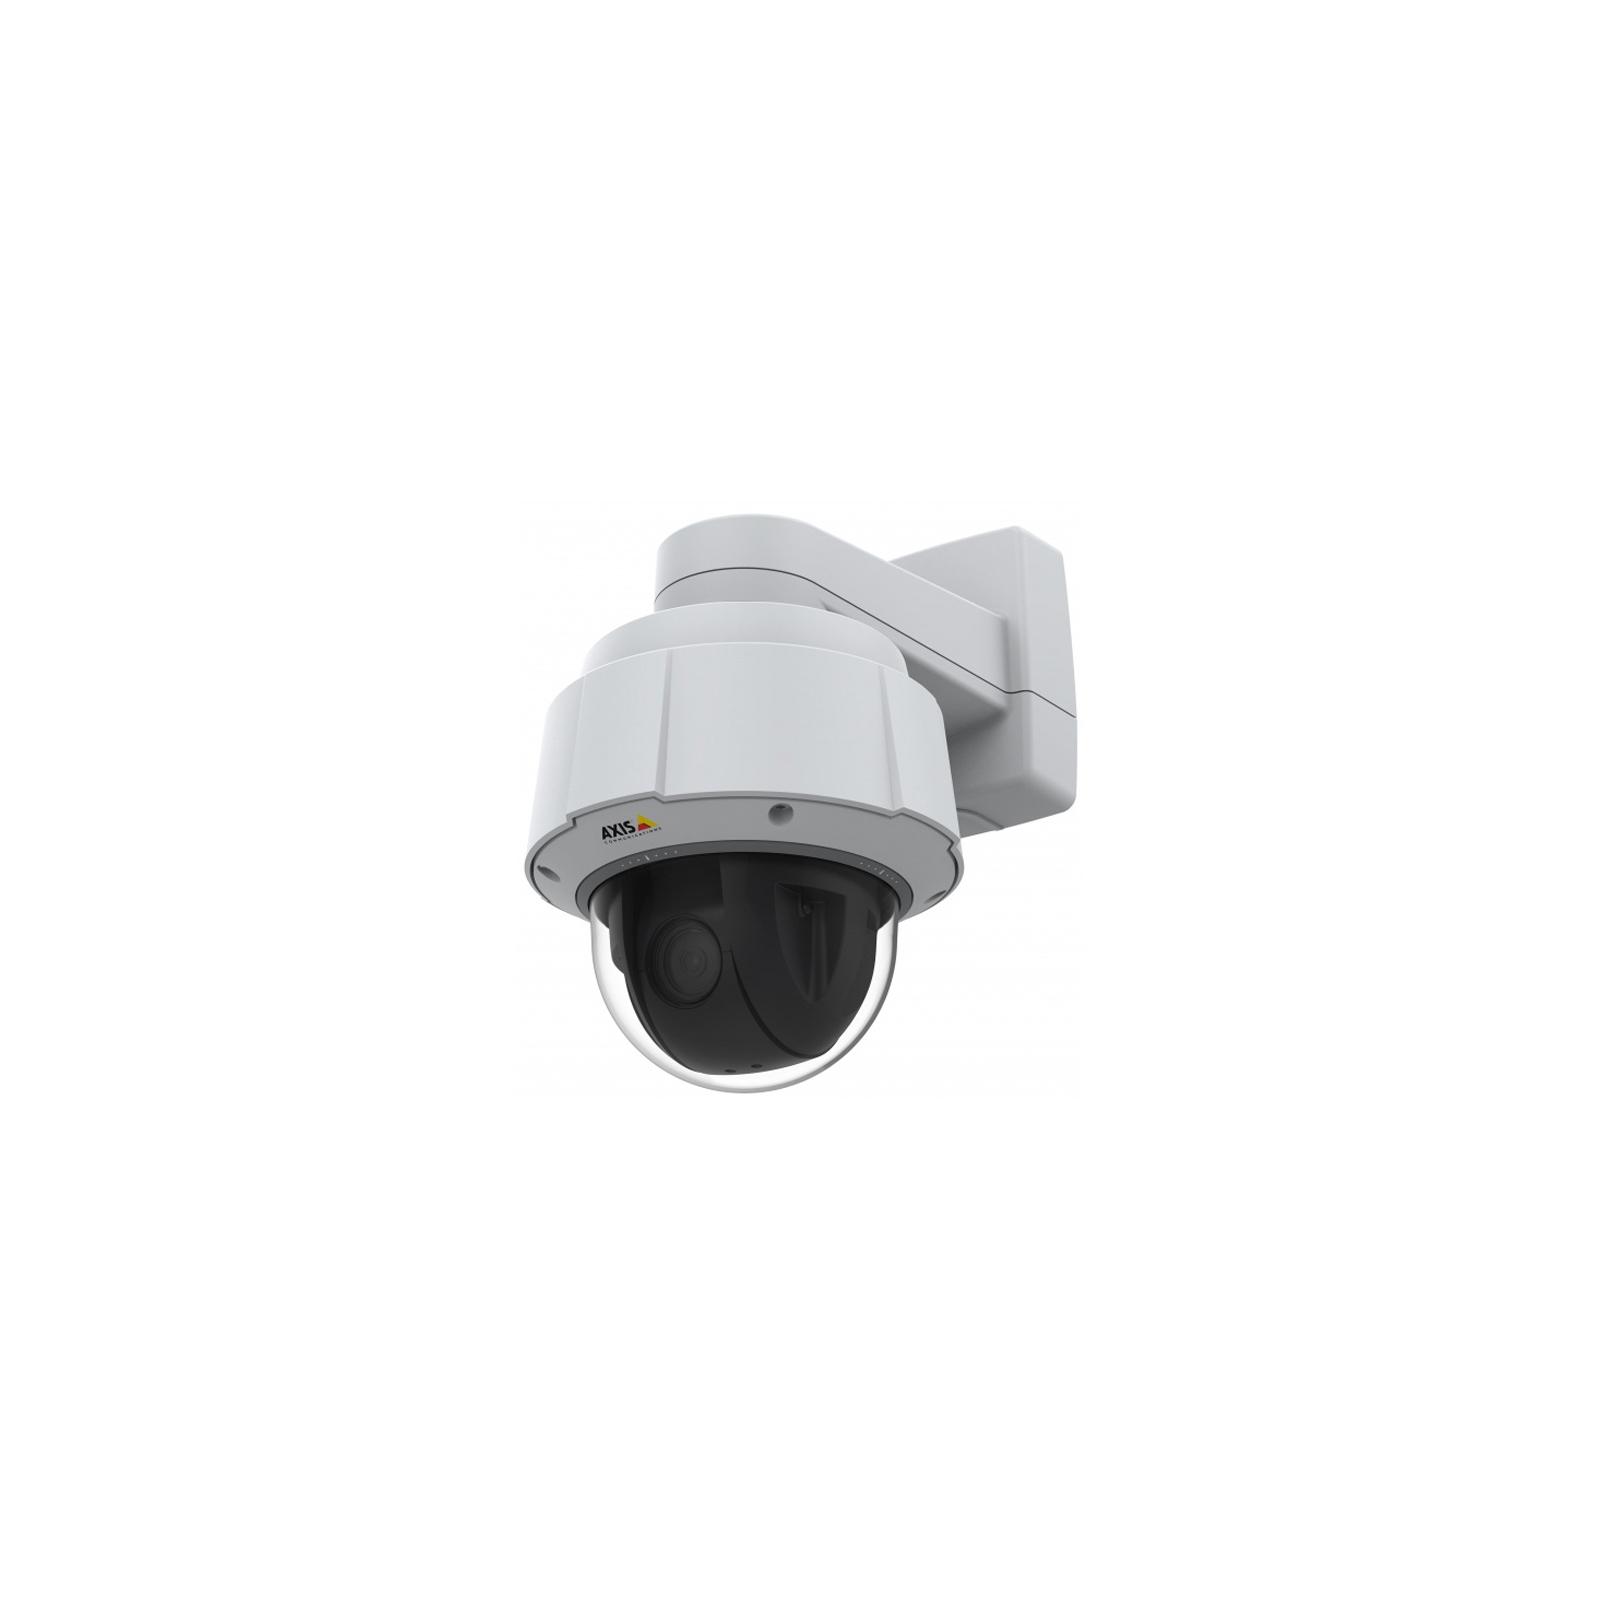 Камера видеонаблюдения Axis Q6075-E 50Hz (PTZ 40x) (01751-002)